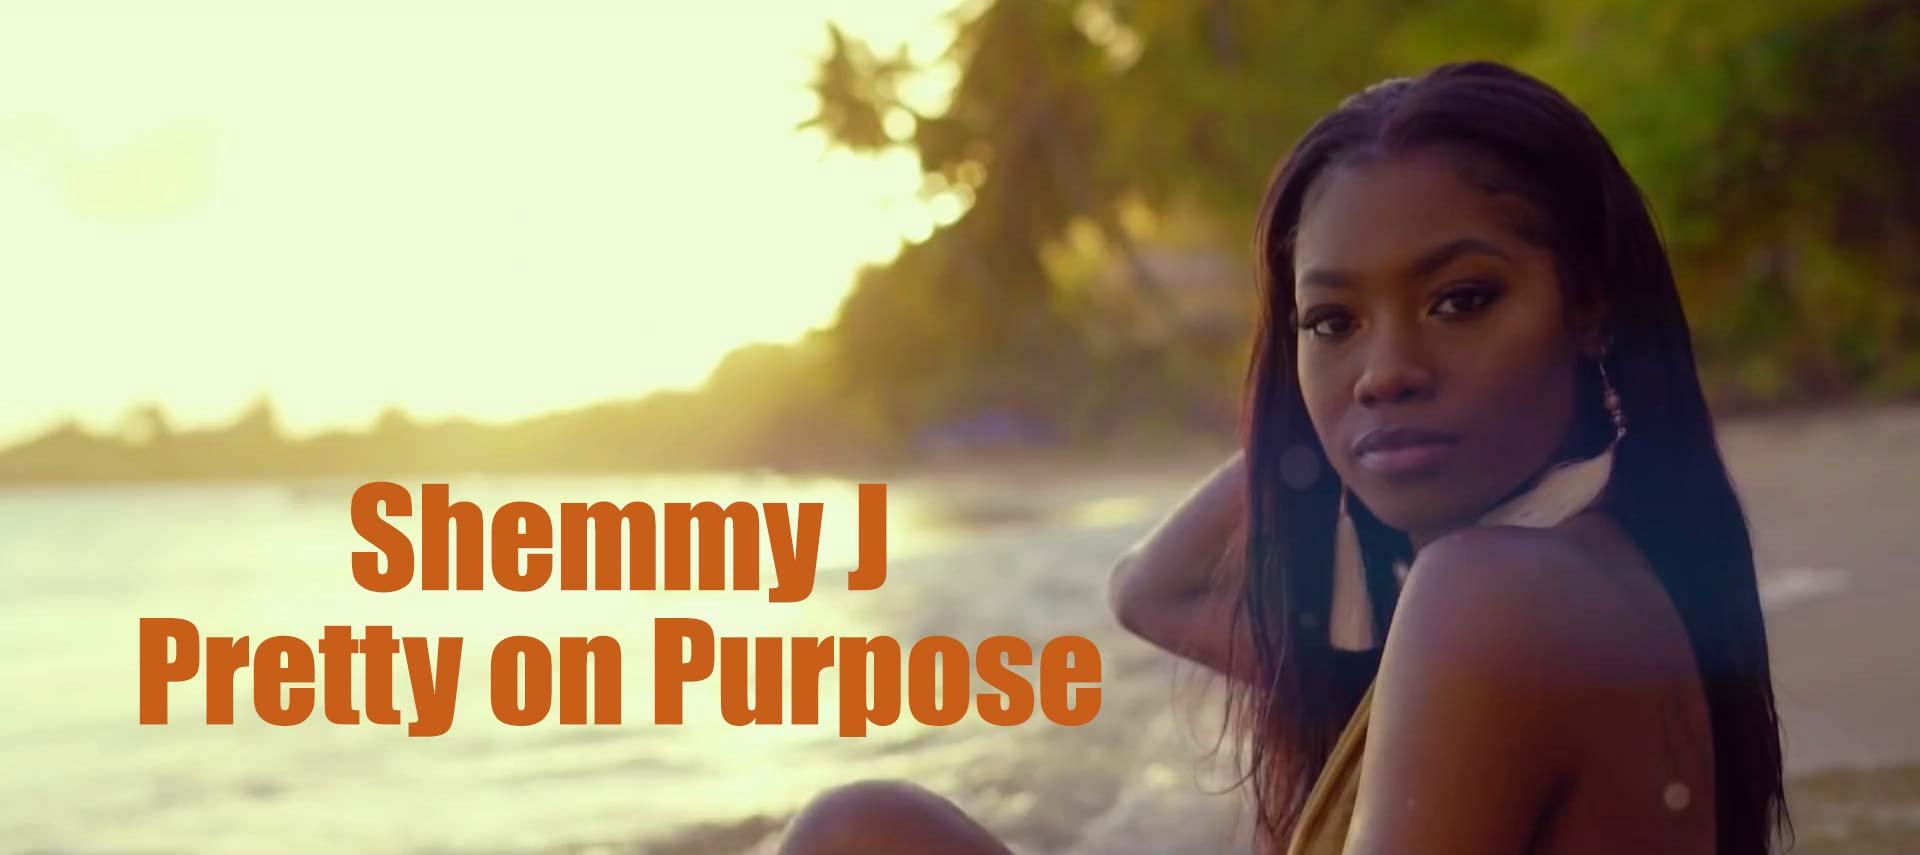 Shemmy J - ``Pretty on Purpose`` Music Video